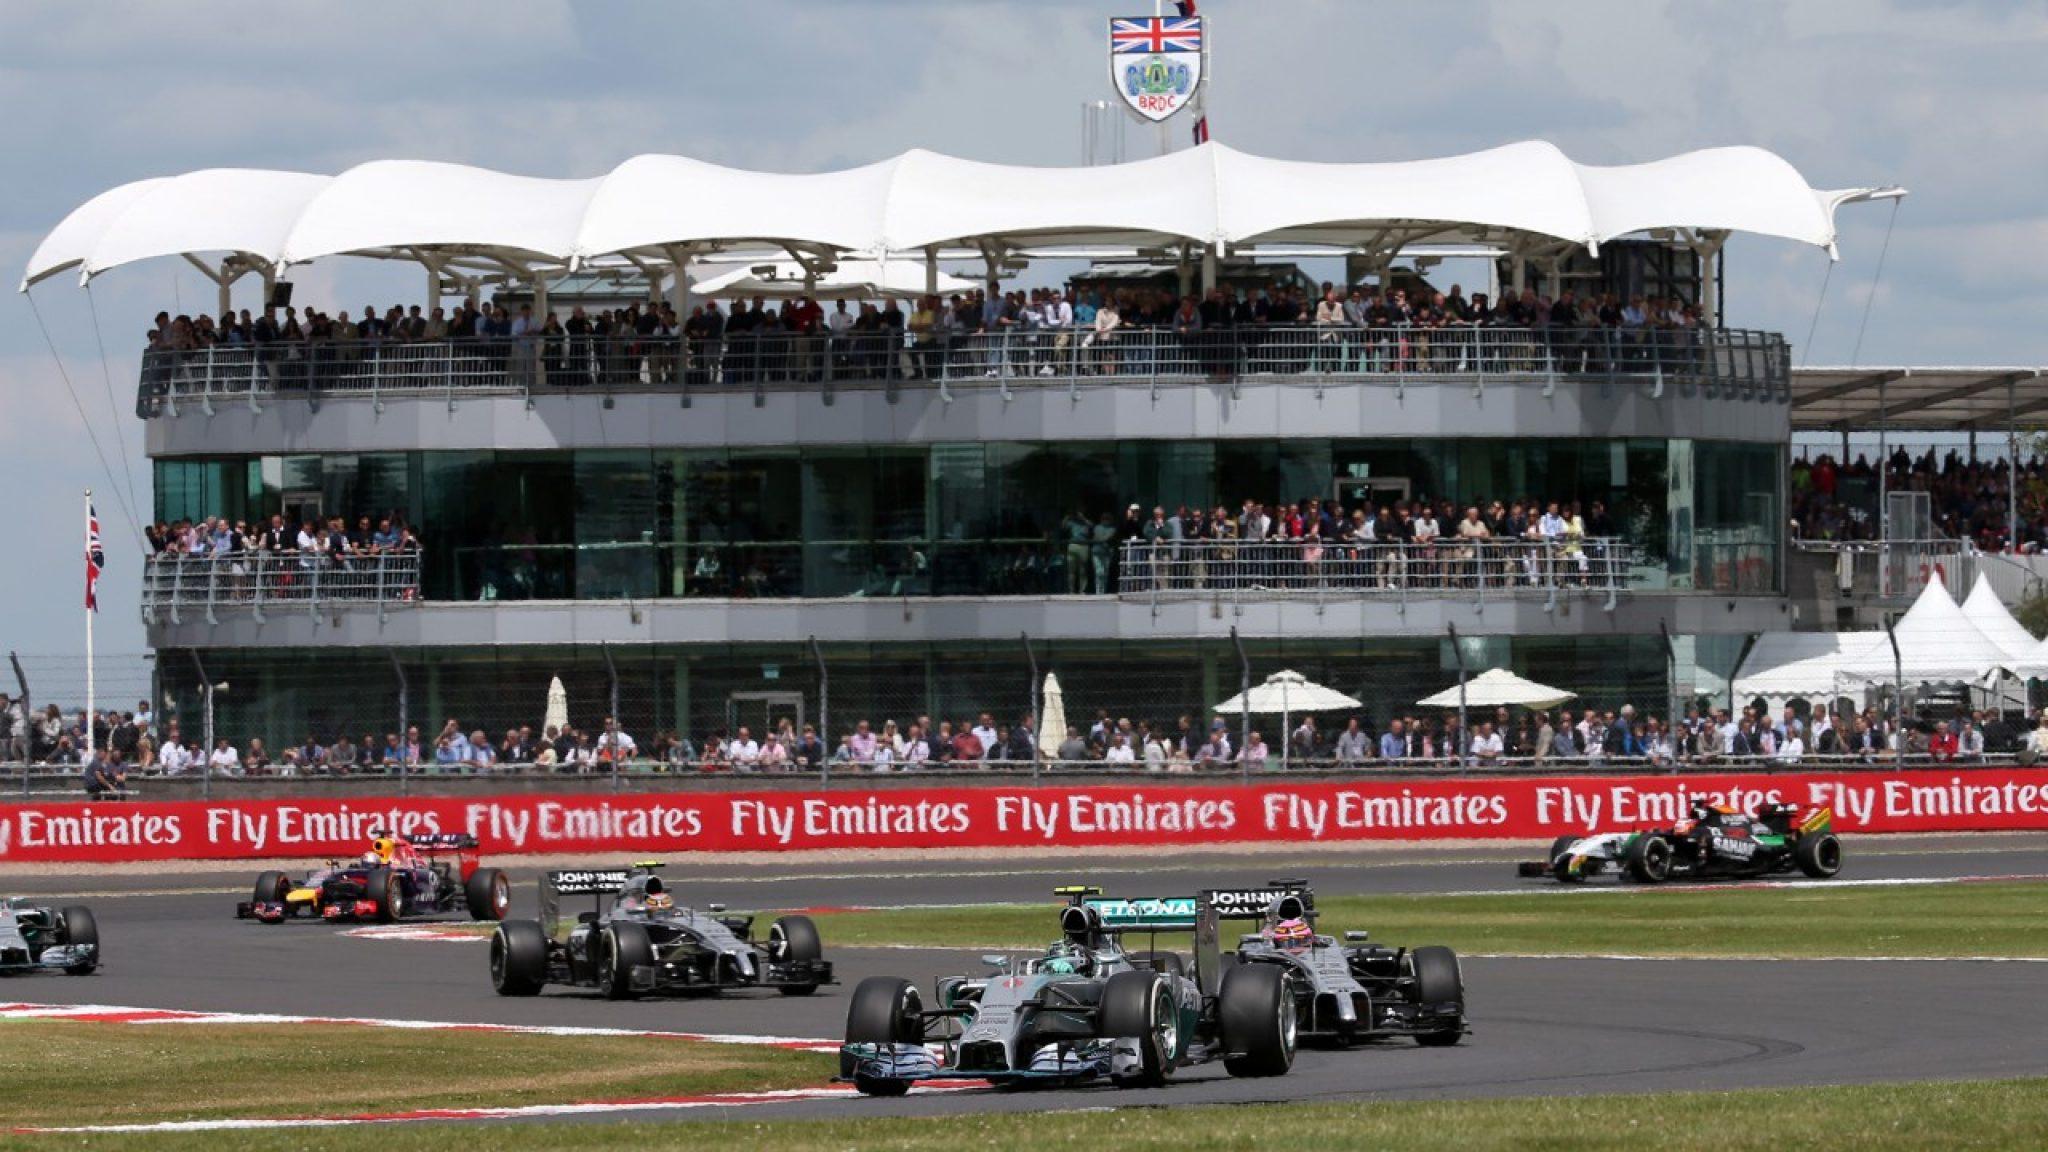 British Grand Prix 2019 97